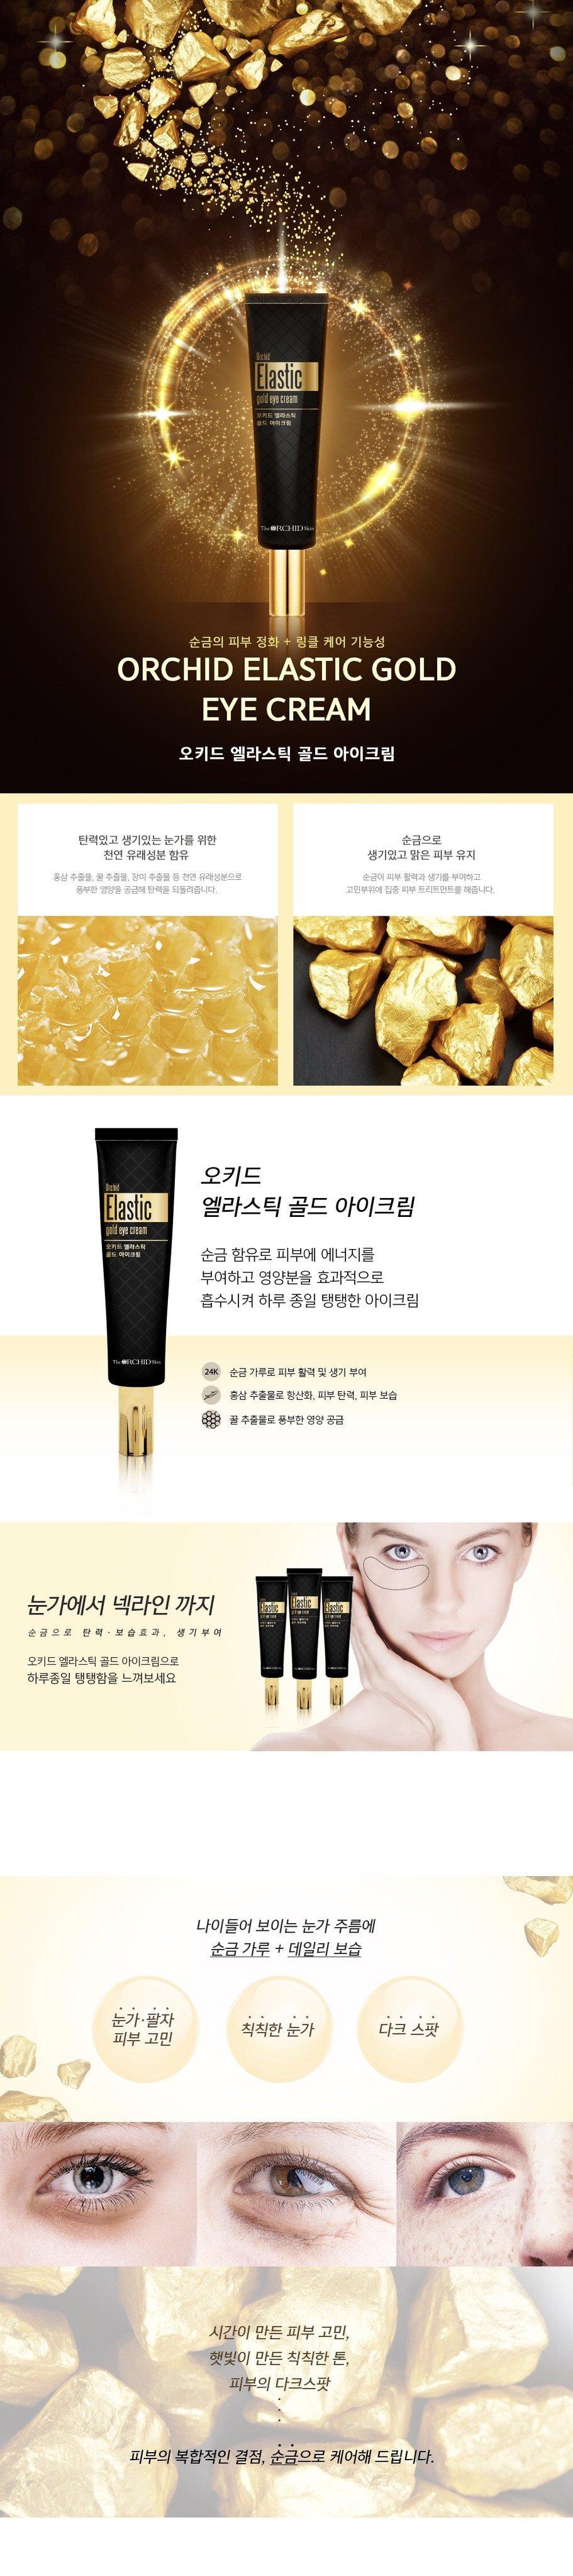 Orchid Elastic Gold Eye Cream